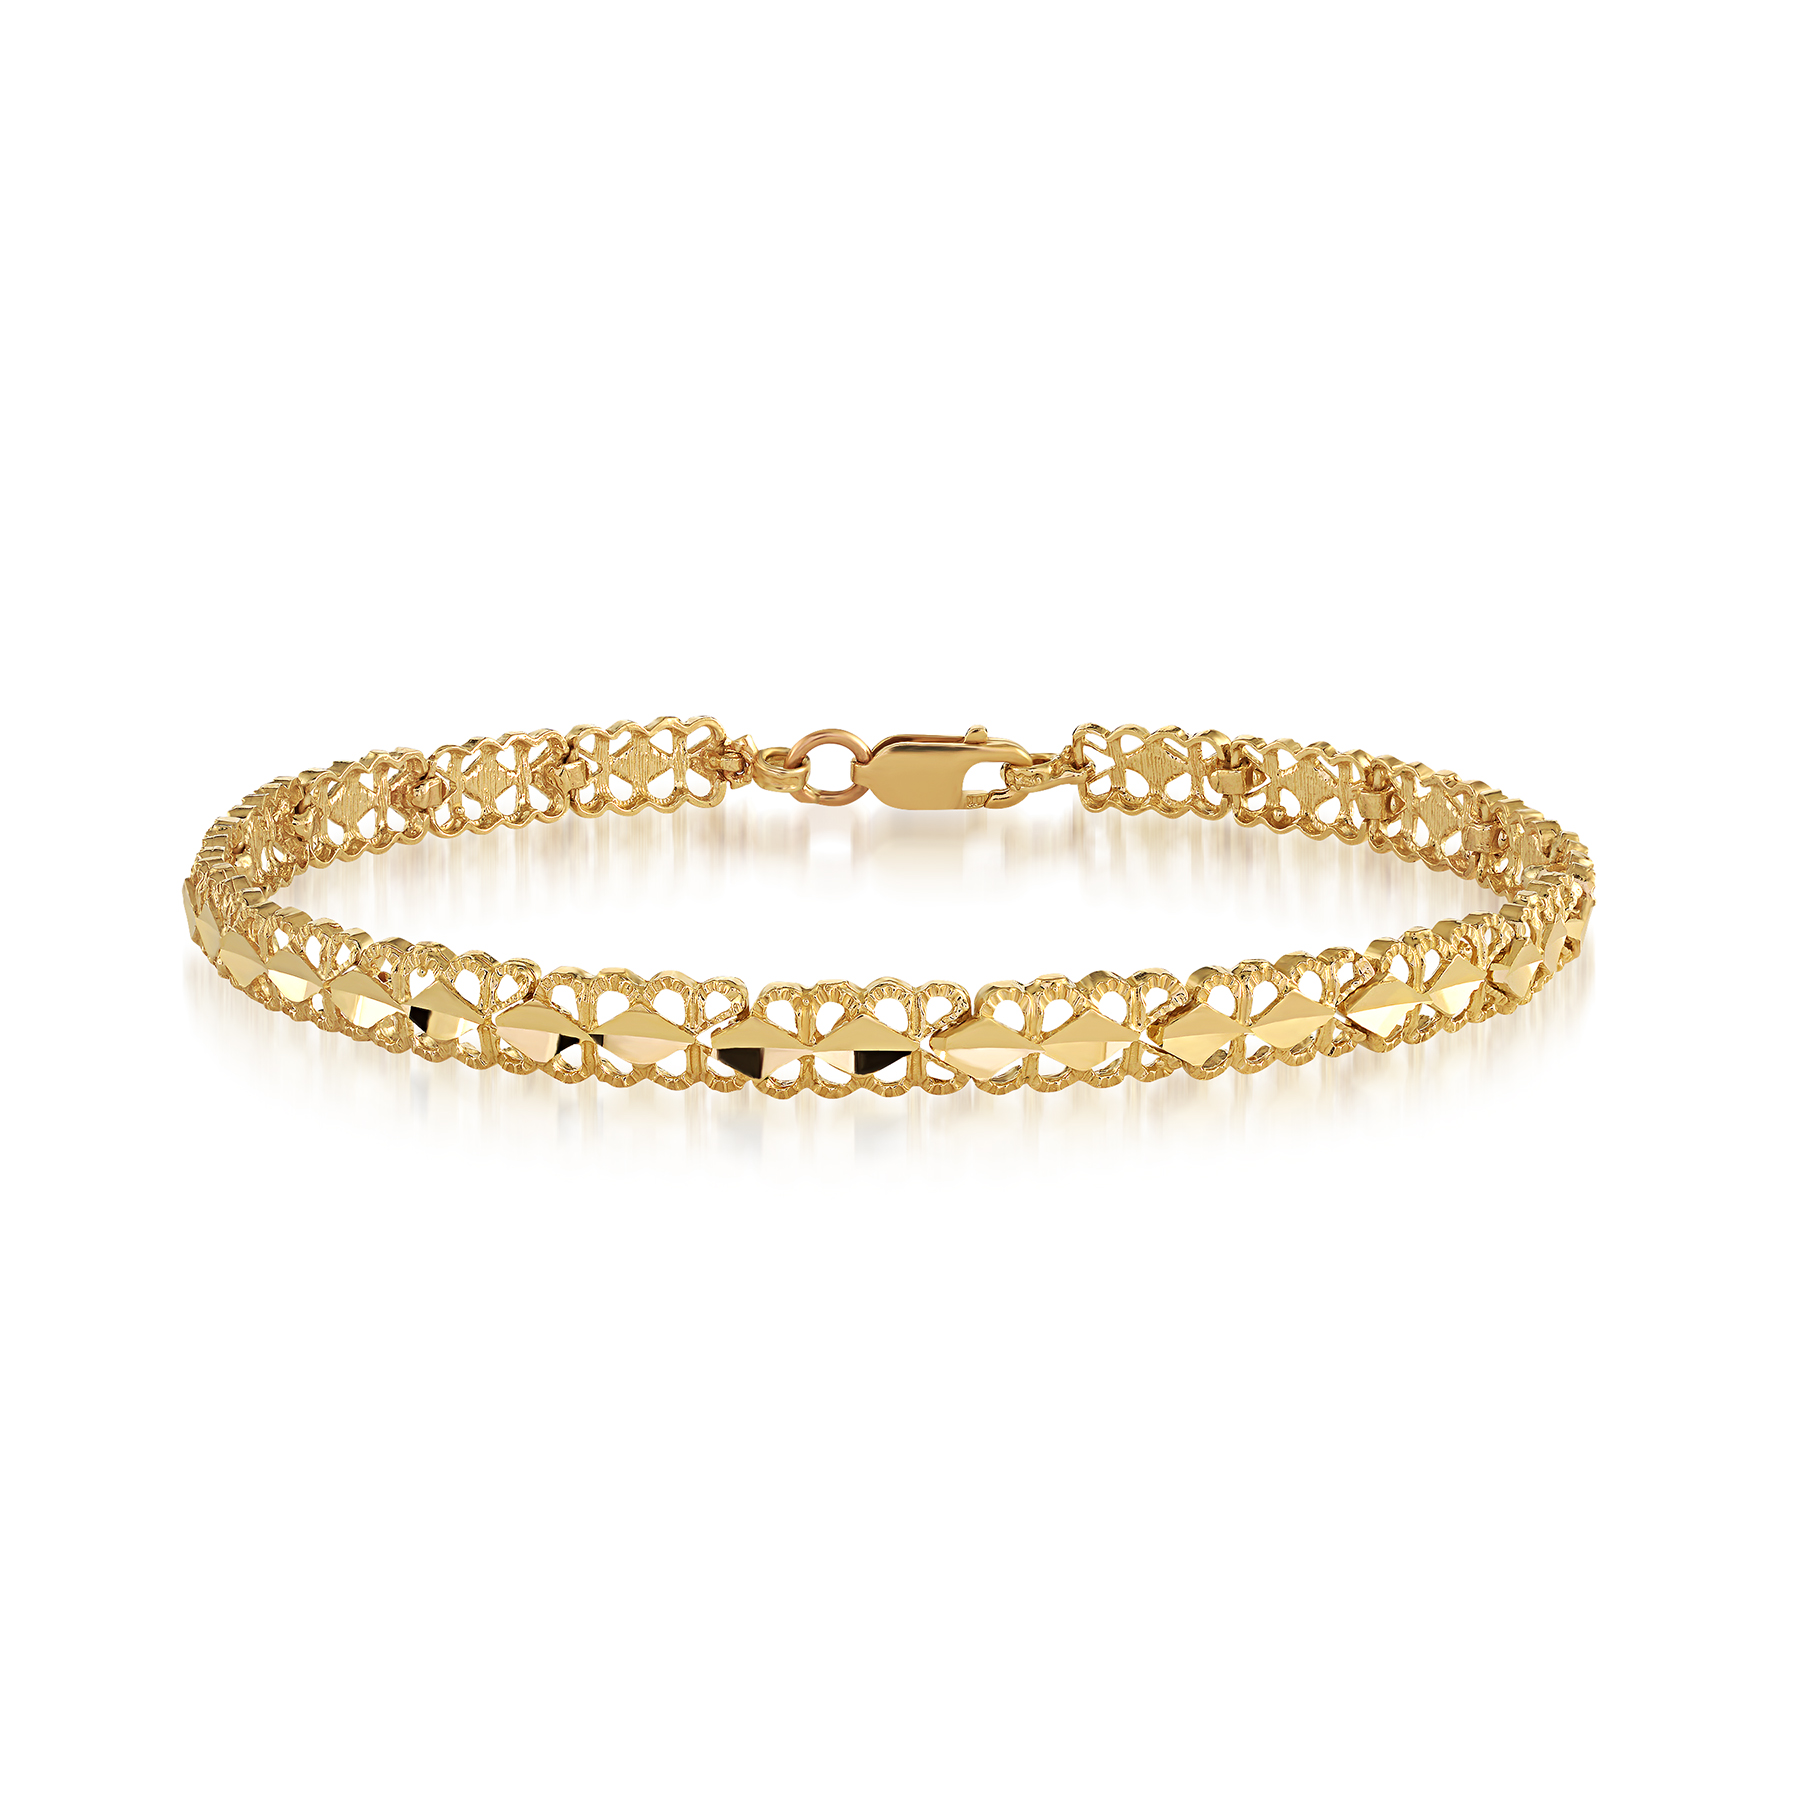 Bracelet for woman - 10K yellow gold